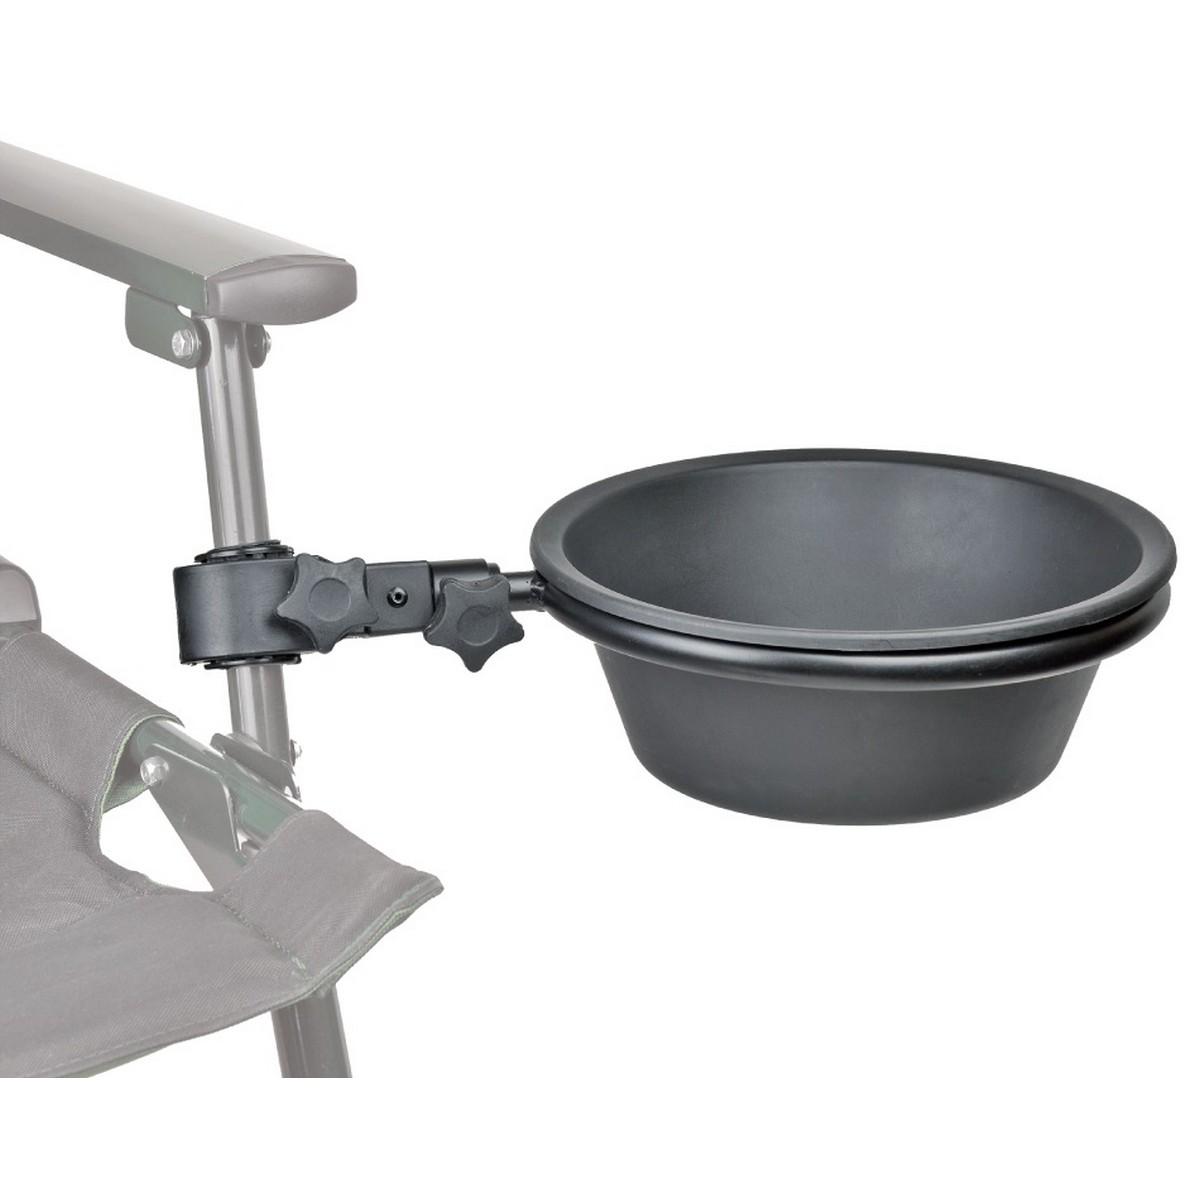 CZ Feeder Competition Bowl with Arm - прикачна за платформа кръгла вана+държач